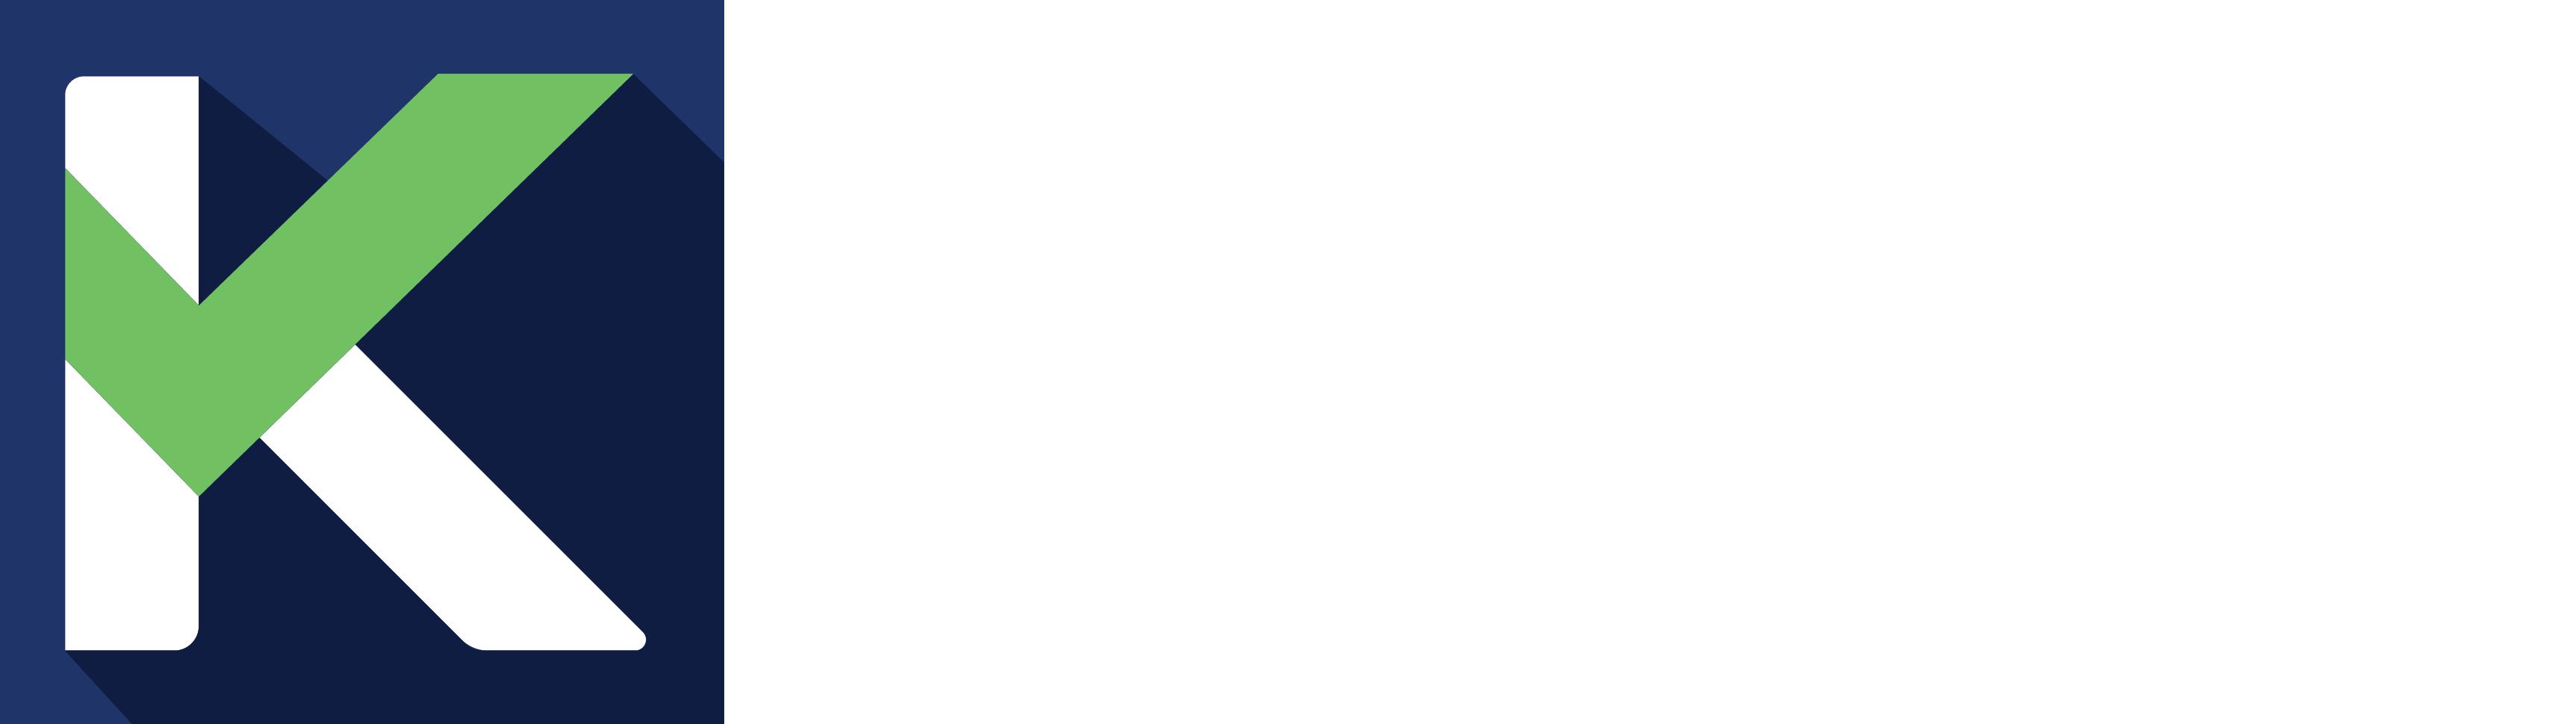 Keystroke - Logistics Invoicing Platform